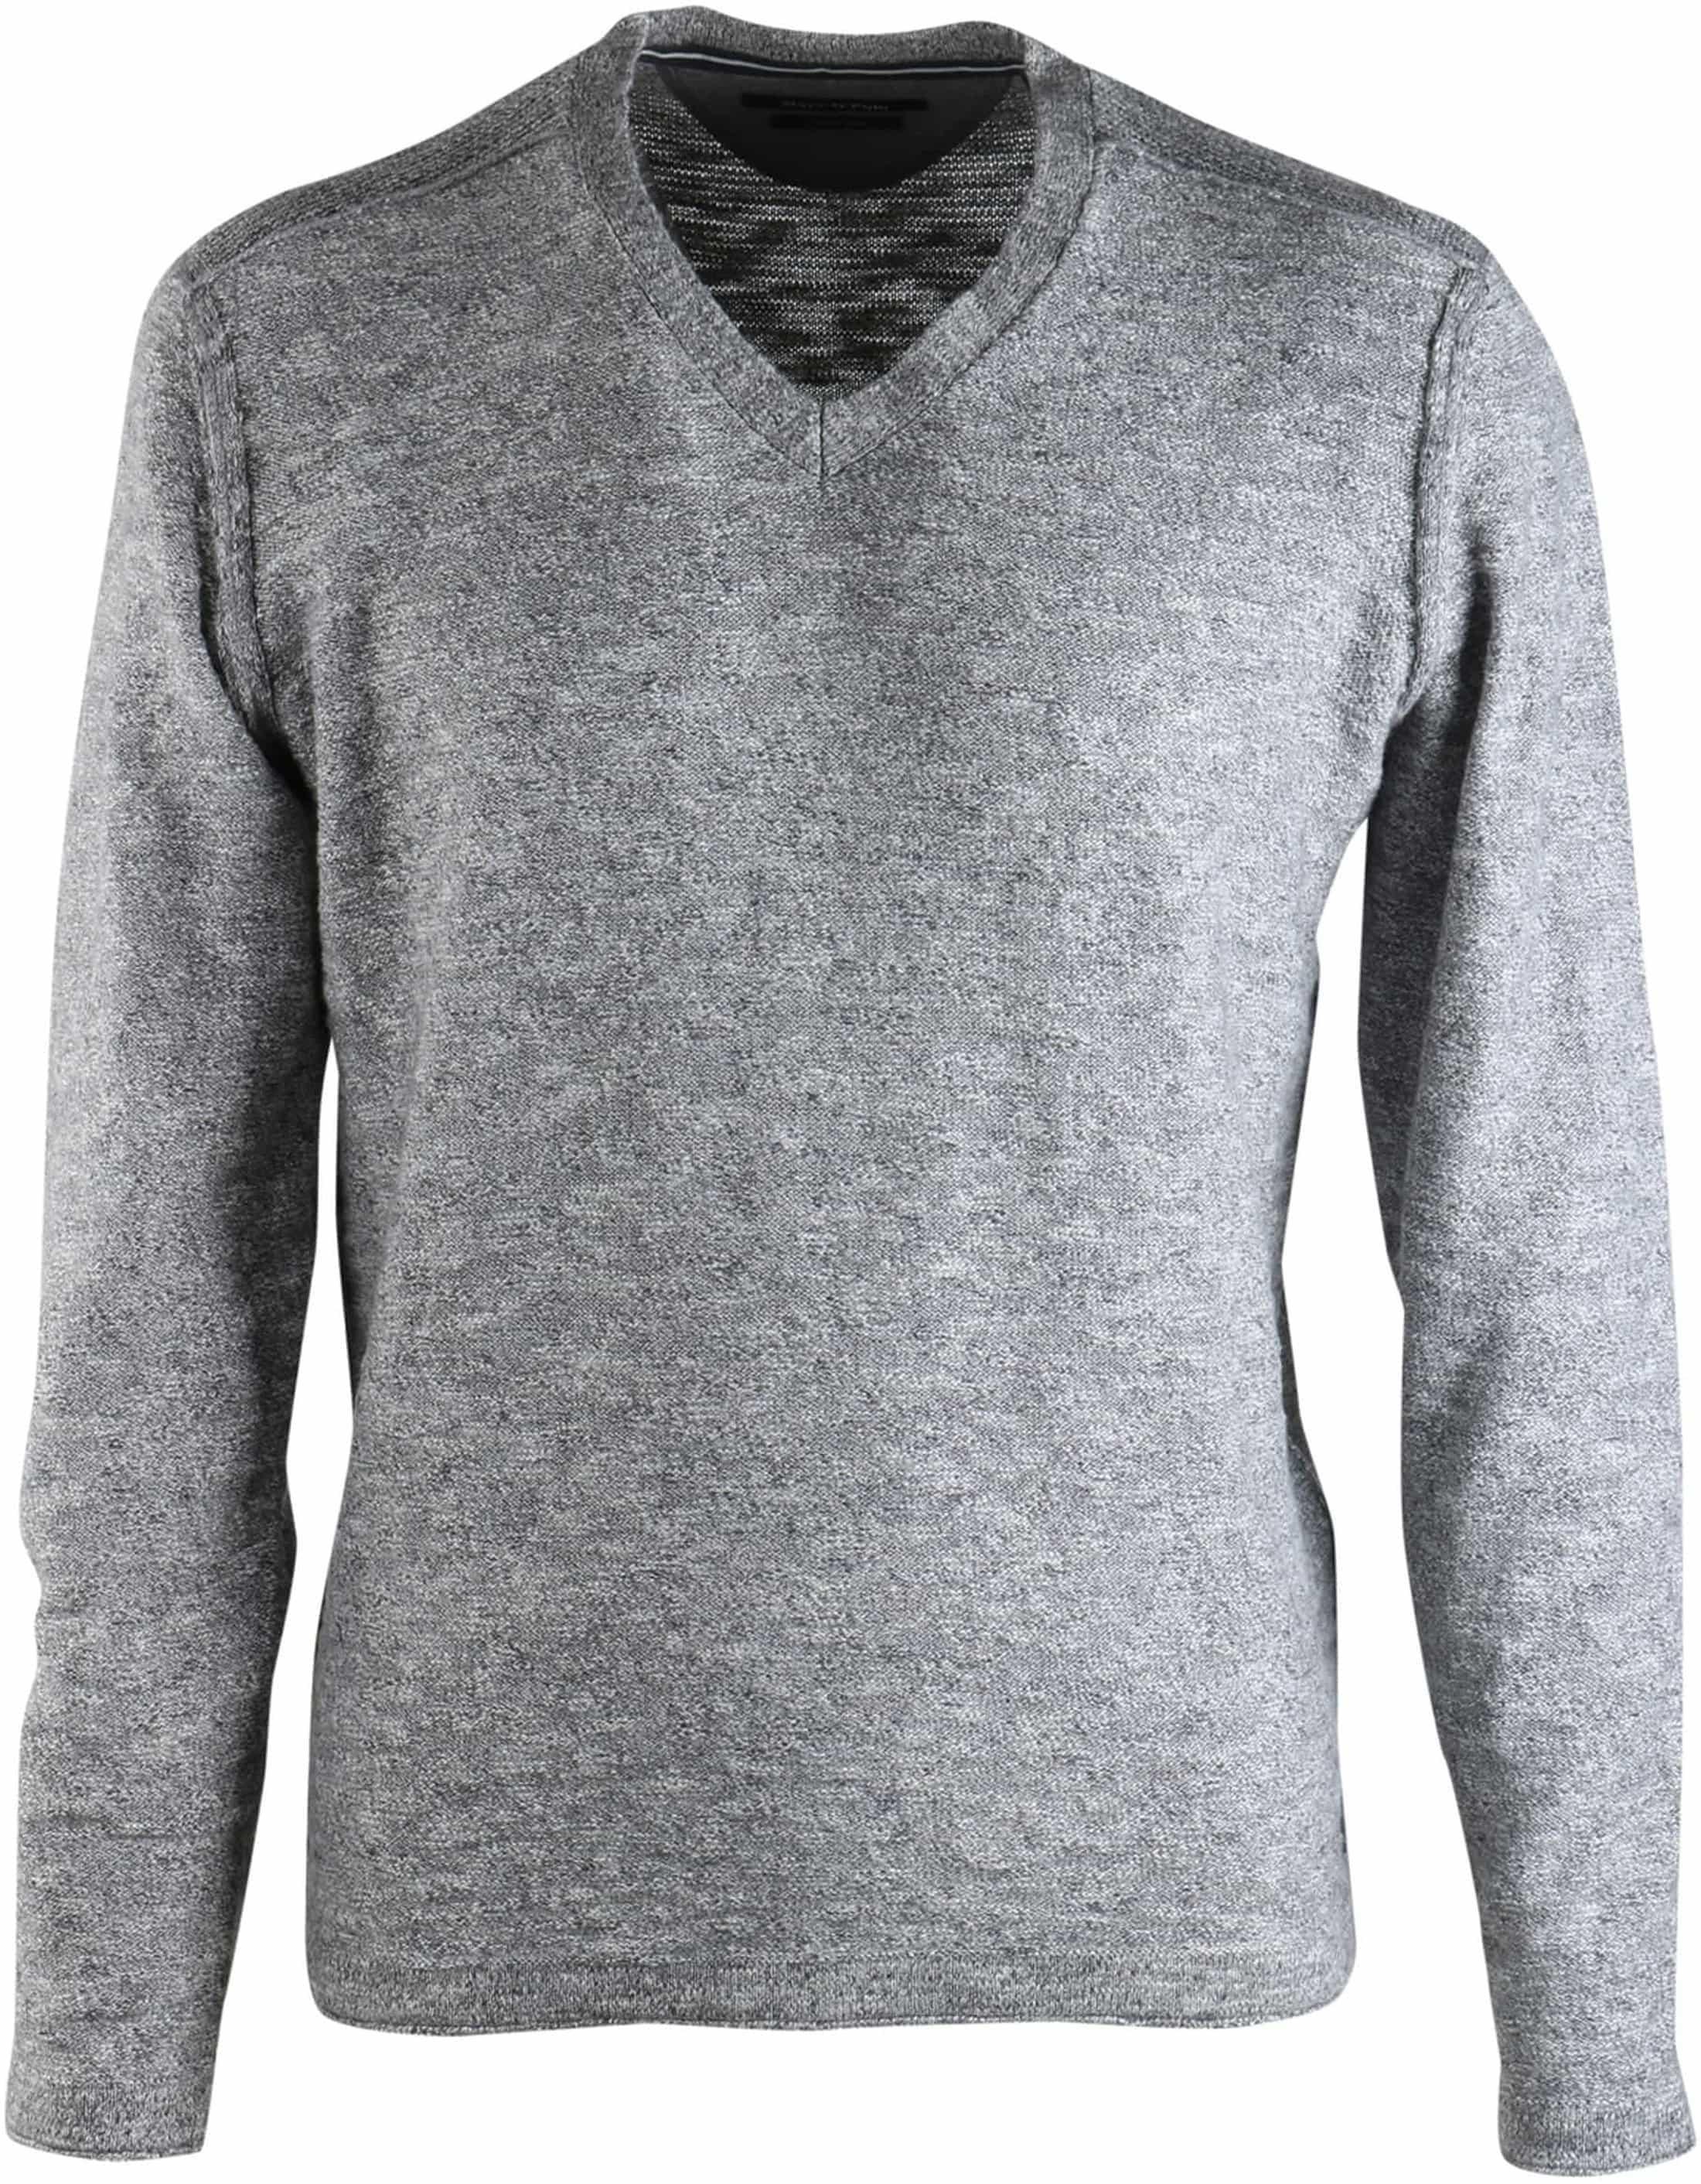 Marc O'Polo Pullover V-Hals Grau foto 0